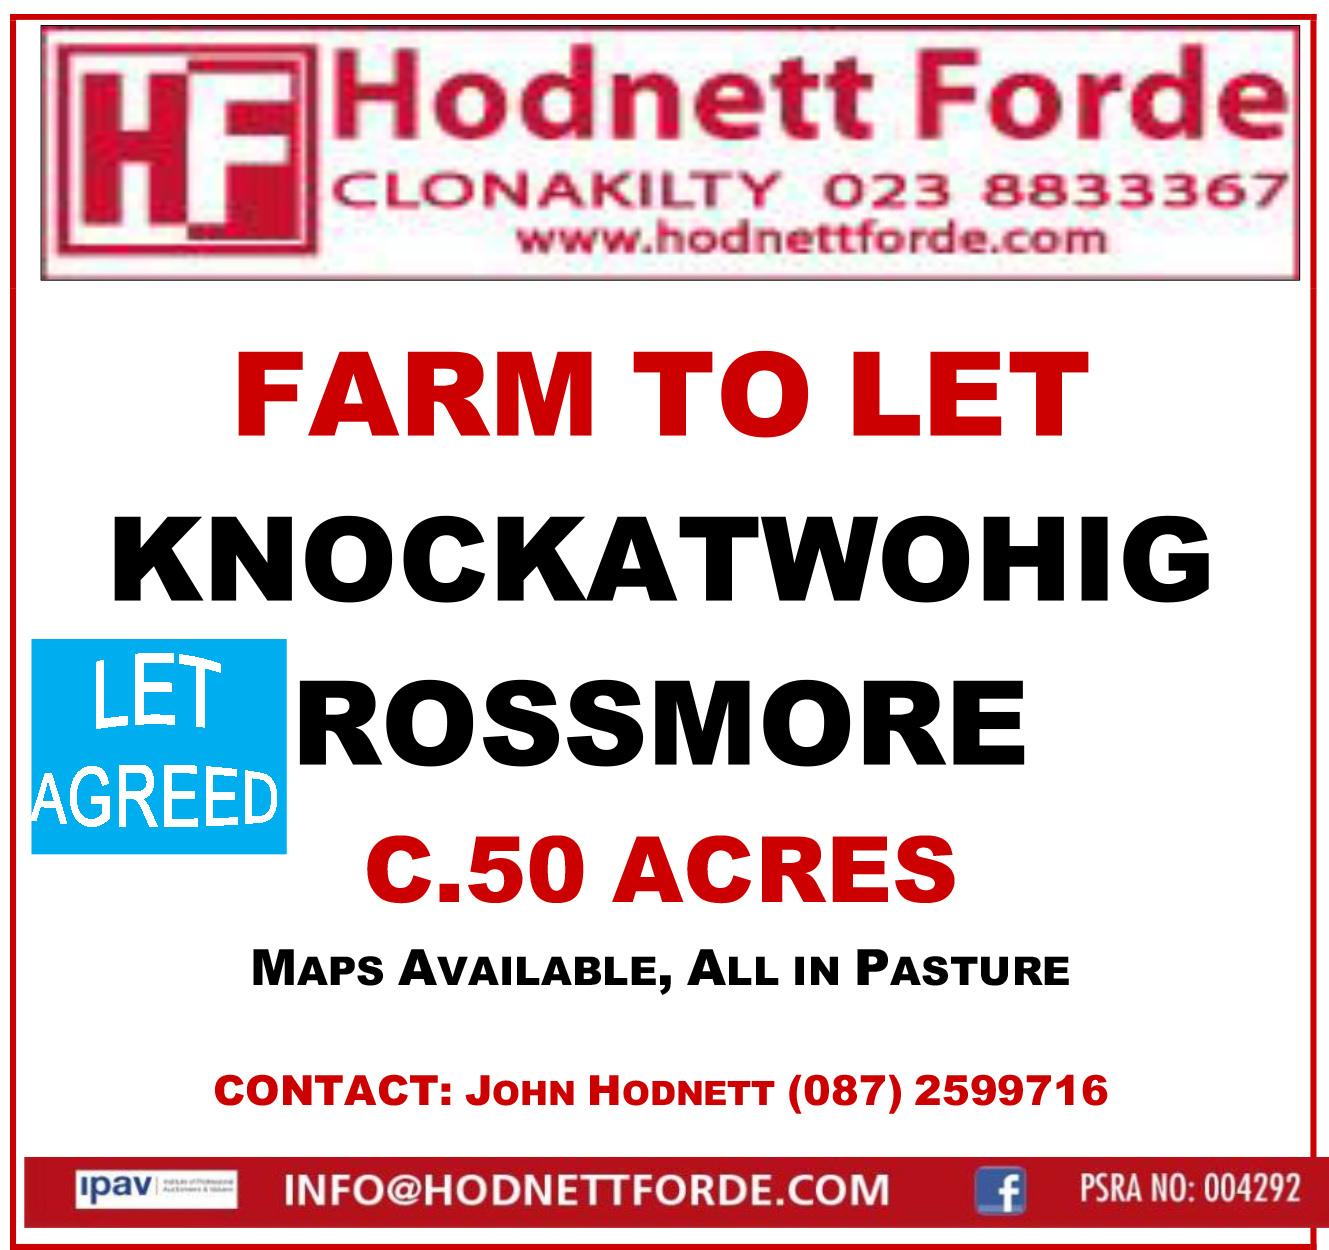 21. Knockatwohig, Rossmore